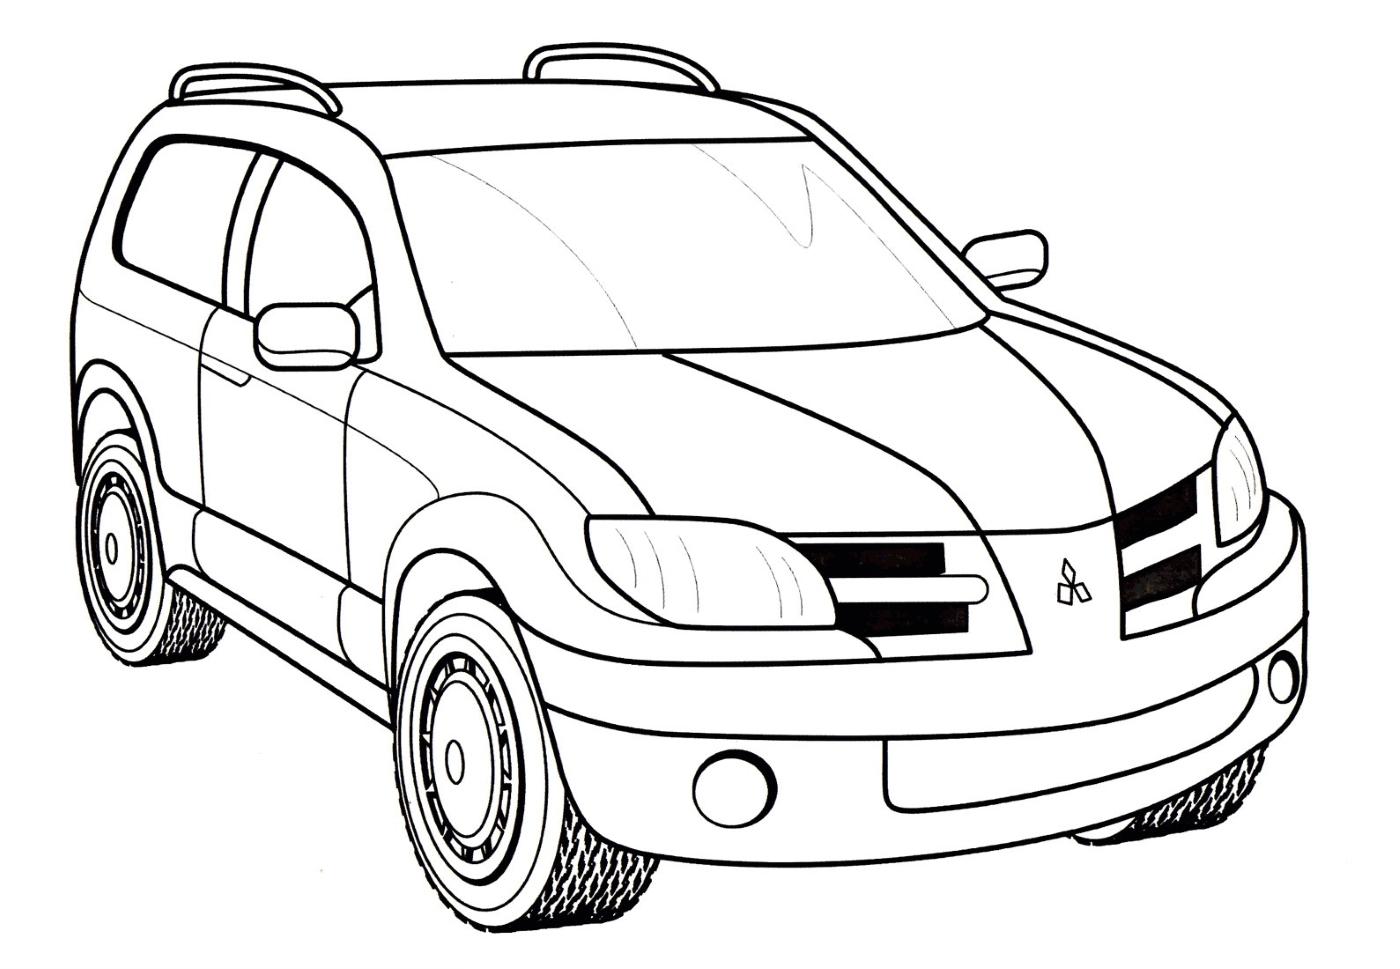 Машина Мицубиси Оутлендер - раскраска №271 | Printonic.ru